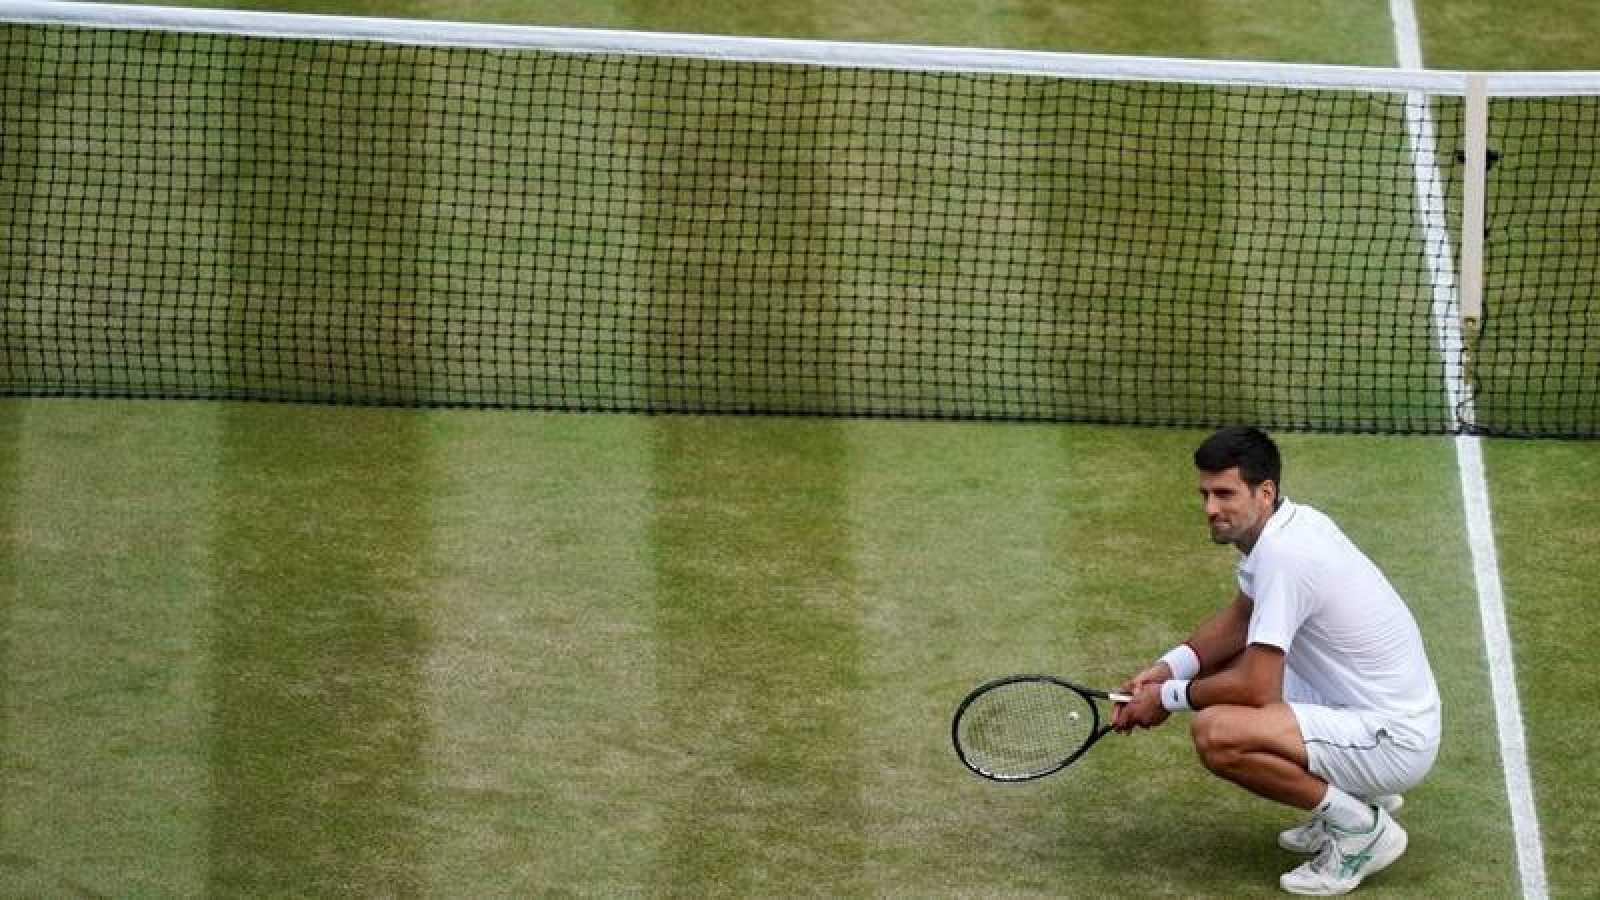 El tenista serbio Novak Djokovic, tras ganar el torneo de Wimbledon en 2019.